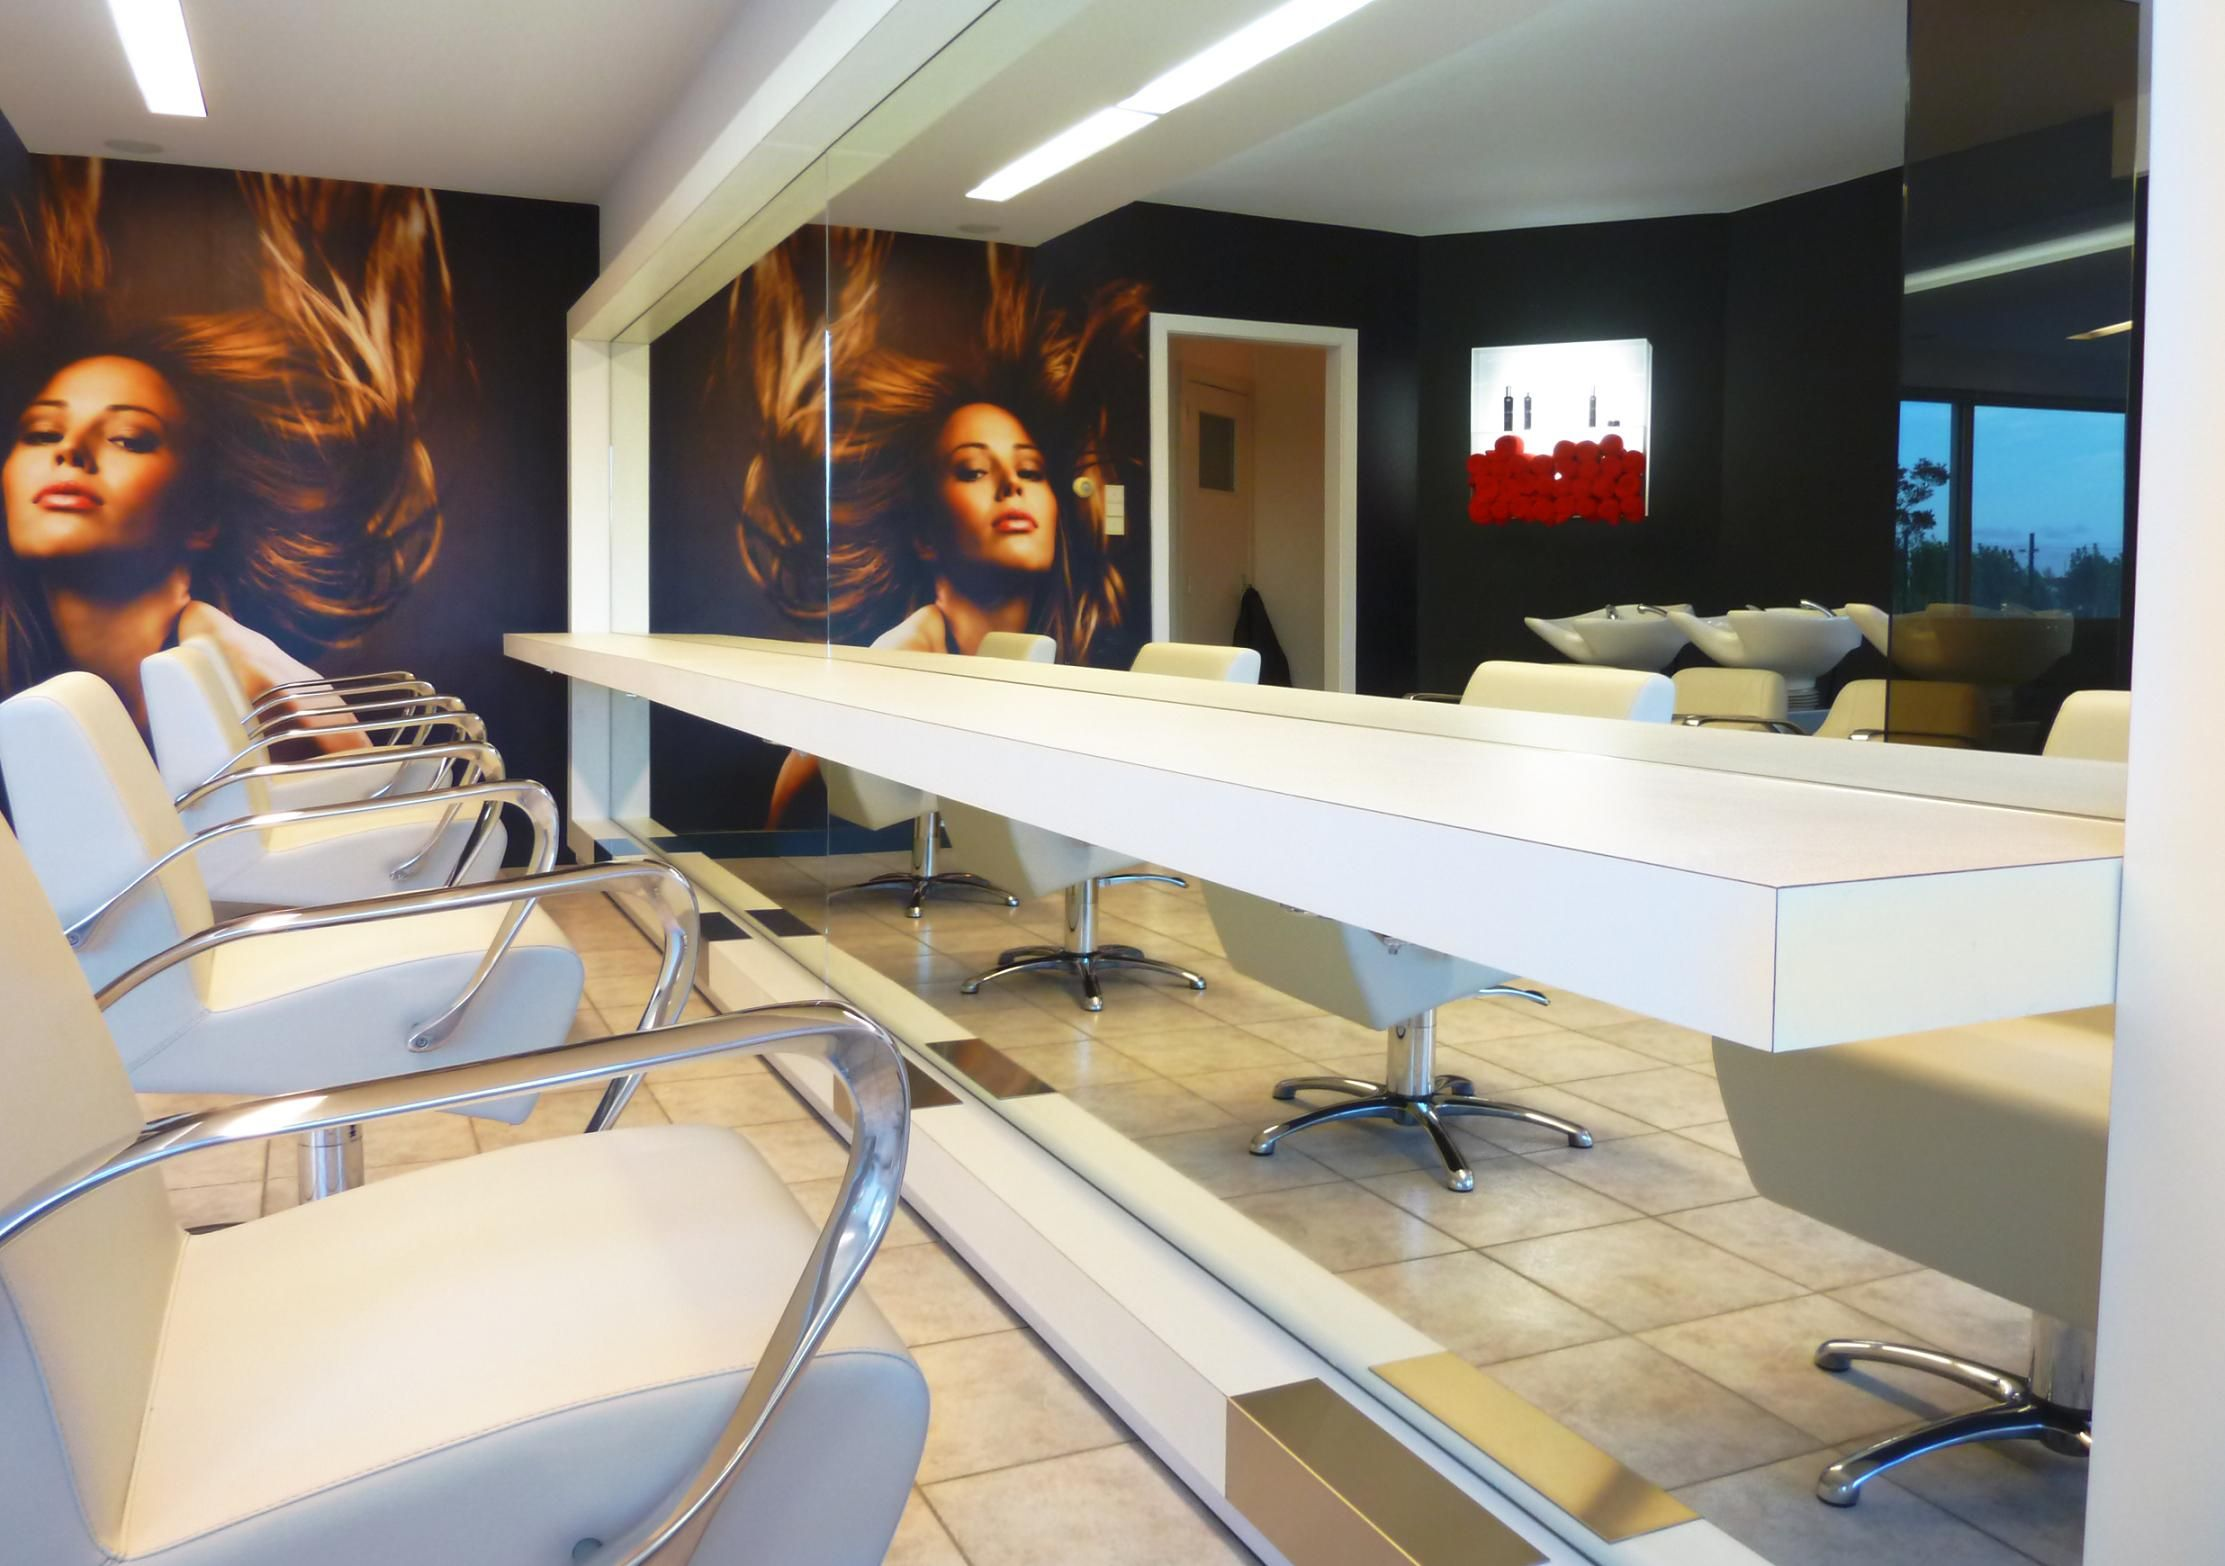 nelson mobilier manufacturer salon furniture made in france salon design hair and beauty. Black Bedroom Furniture Sets. Home Design Ideas